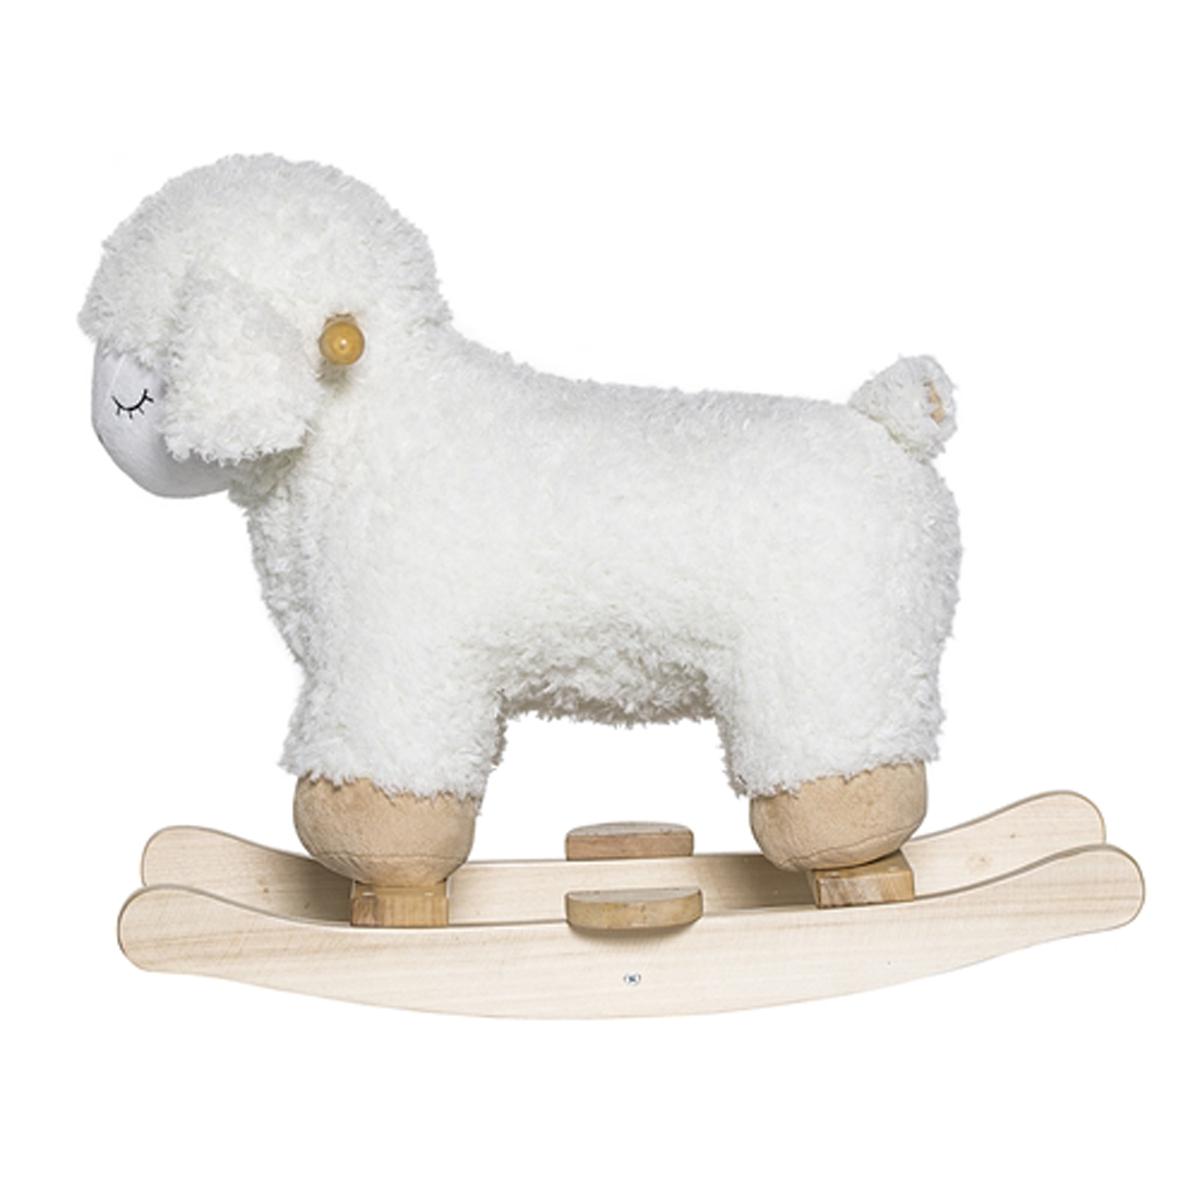 bloomingville mouton bascule blanc trotteur. Black Bedroom Furniture Sets. Home Design Ideas